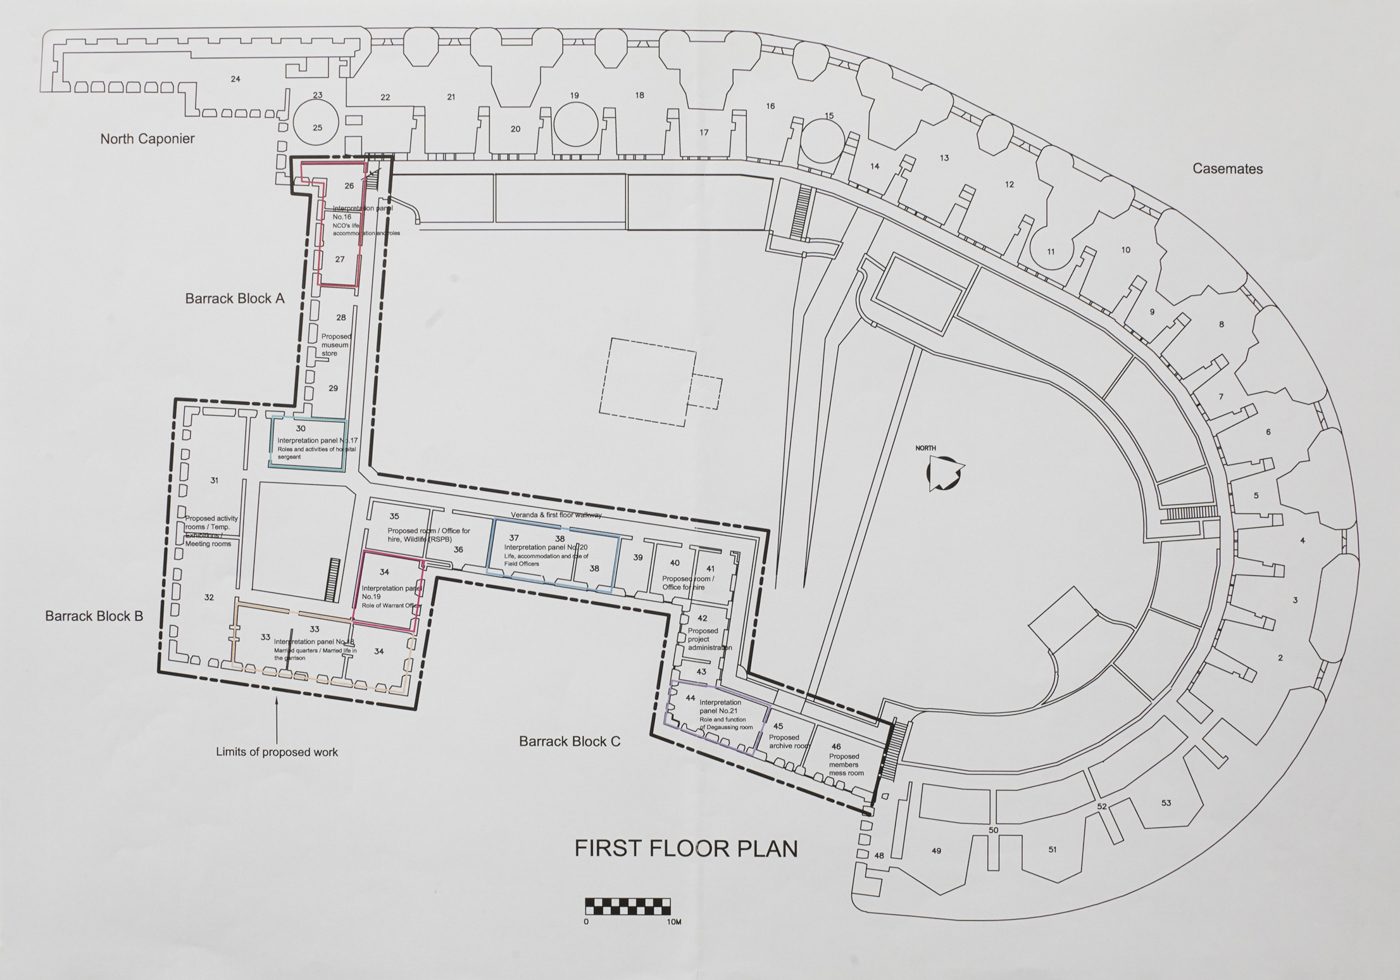 Plan_First_Floor.jpg